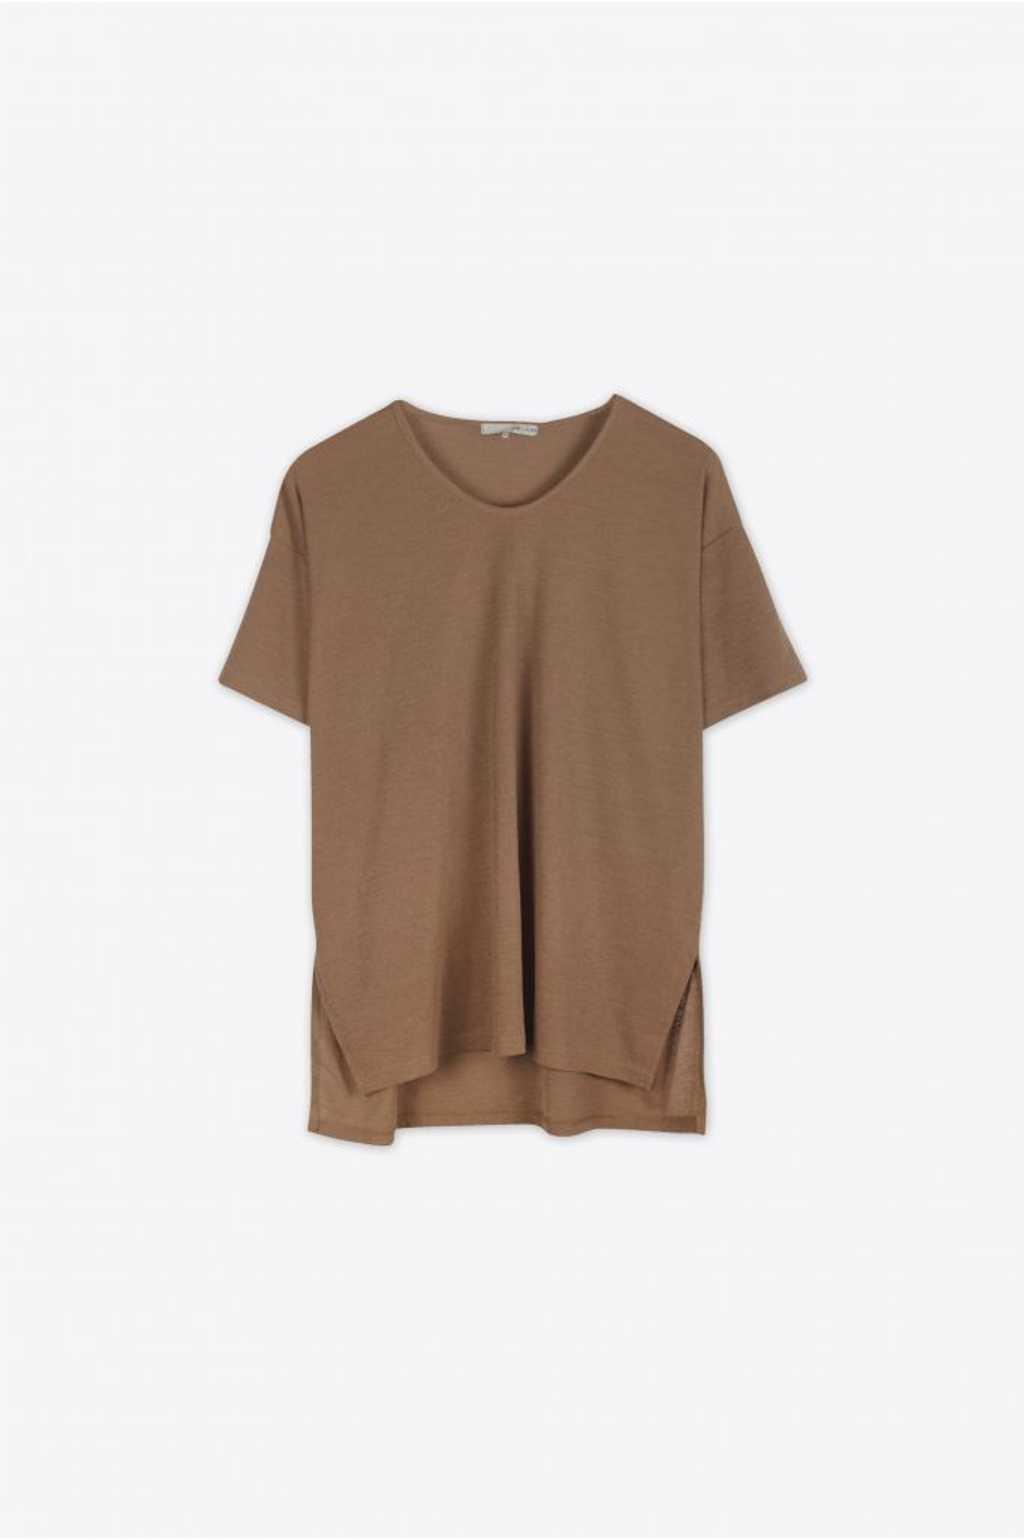 TShirt H241 Brown 5